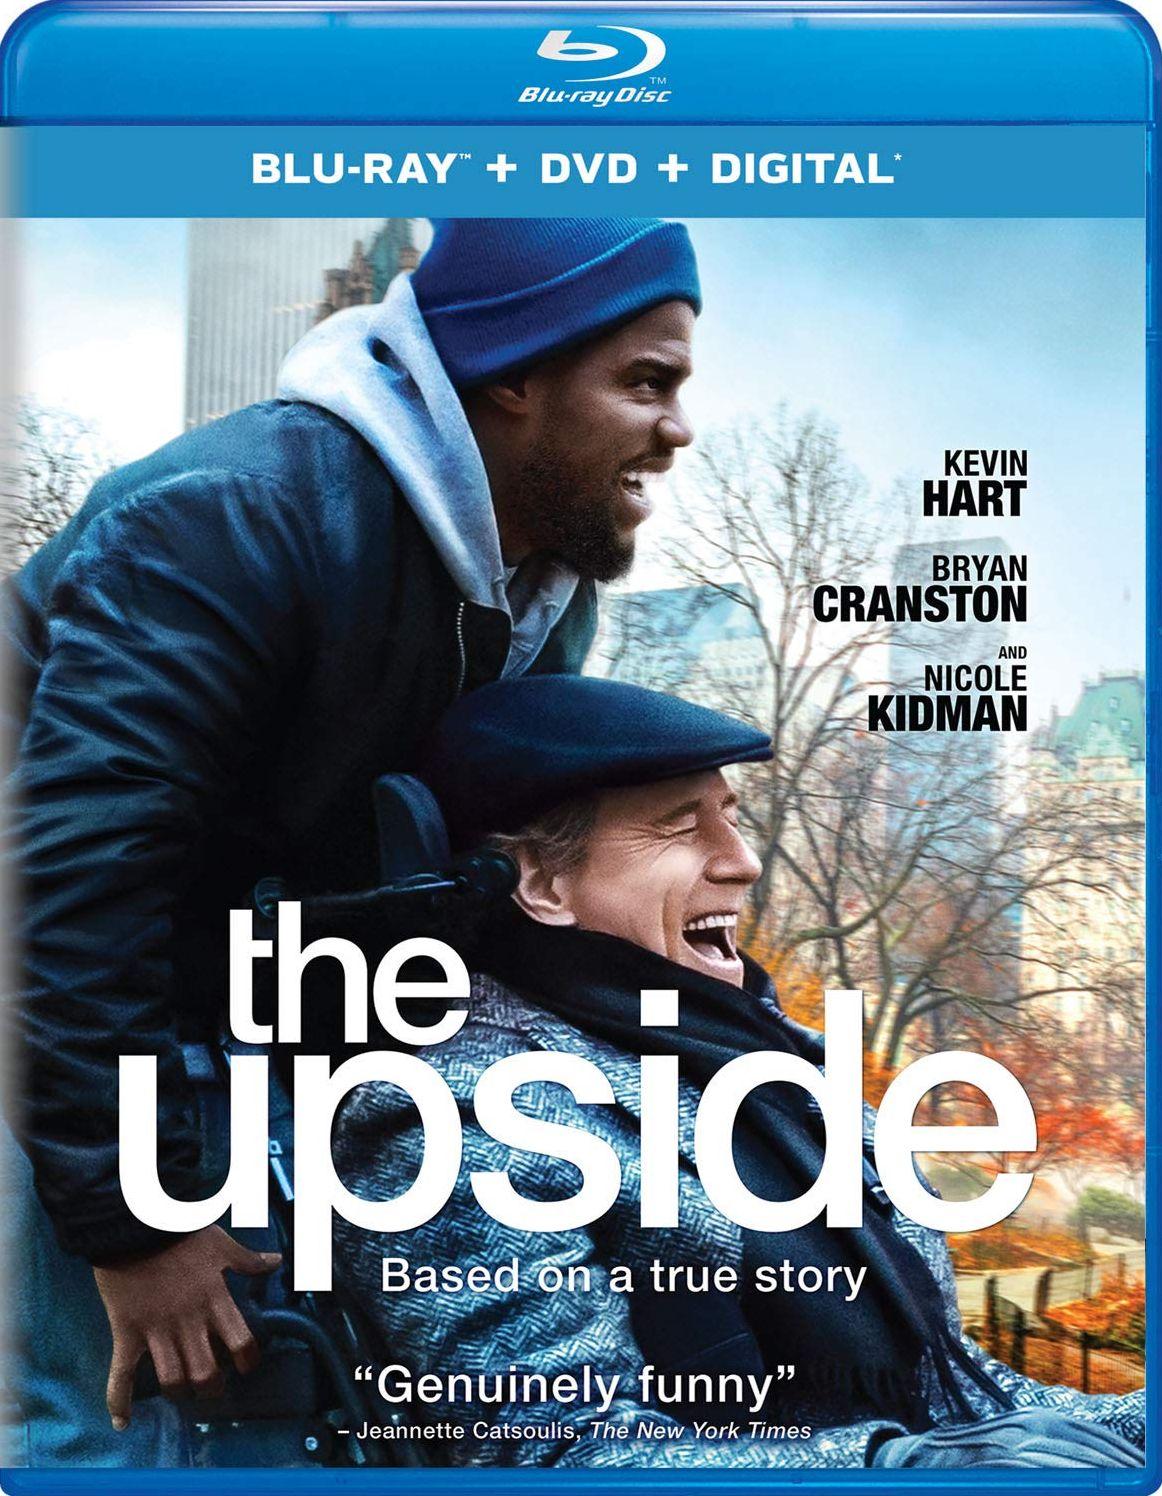 THE UPSIDE BLURAY (UNIVERSAL STUDIOS) The upside, Blu